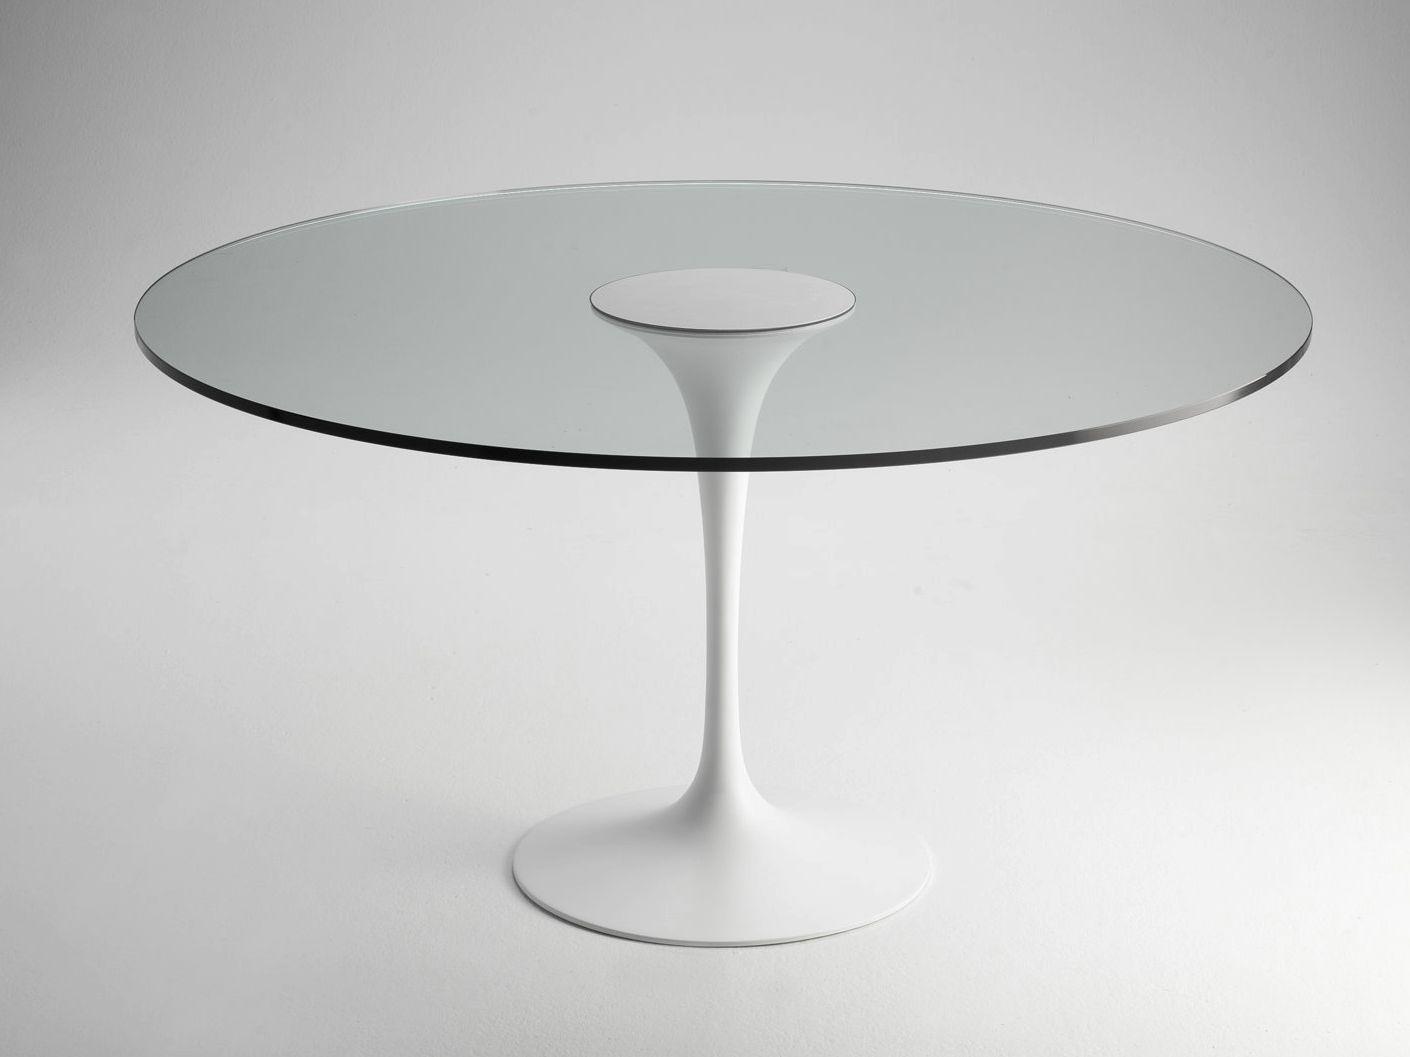 Round Steel Coffee Table Sa59 1 Sofas Collection By Matrix International Design Eero Saarinen Round Coffee Table Table Glass Top Table [ 1057 x 1410 Pixel ]